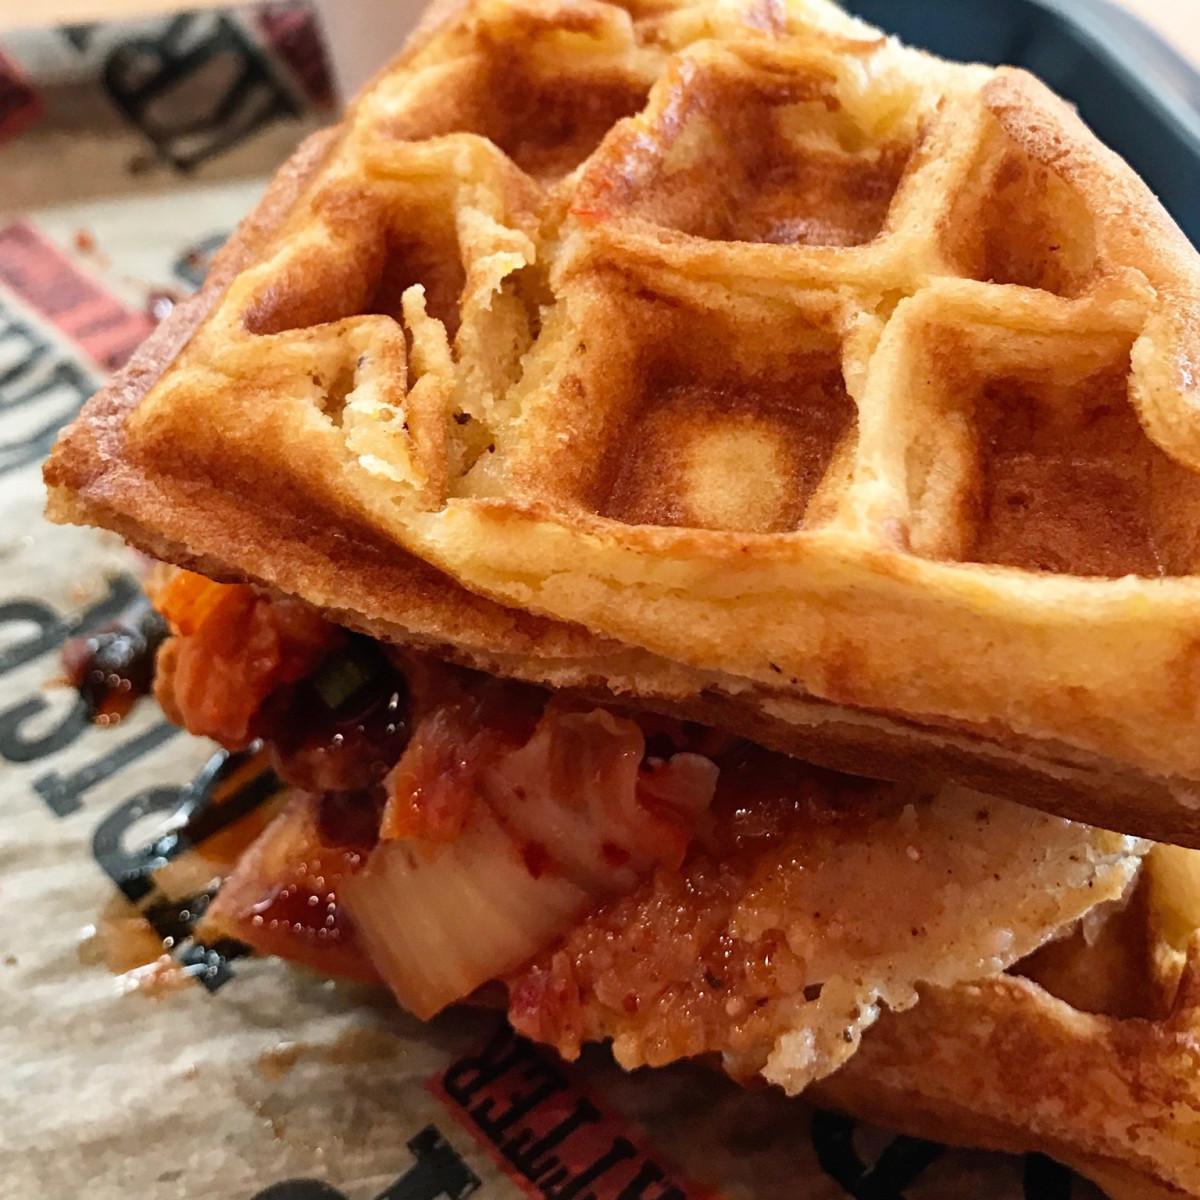 Krisp Bird & Batter Korean sandwich waffle